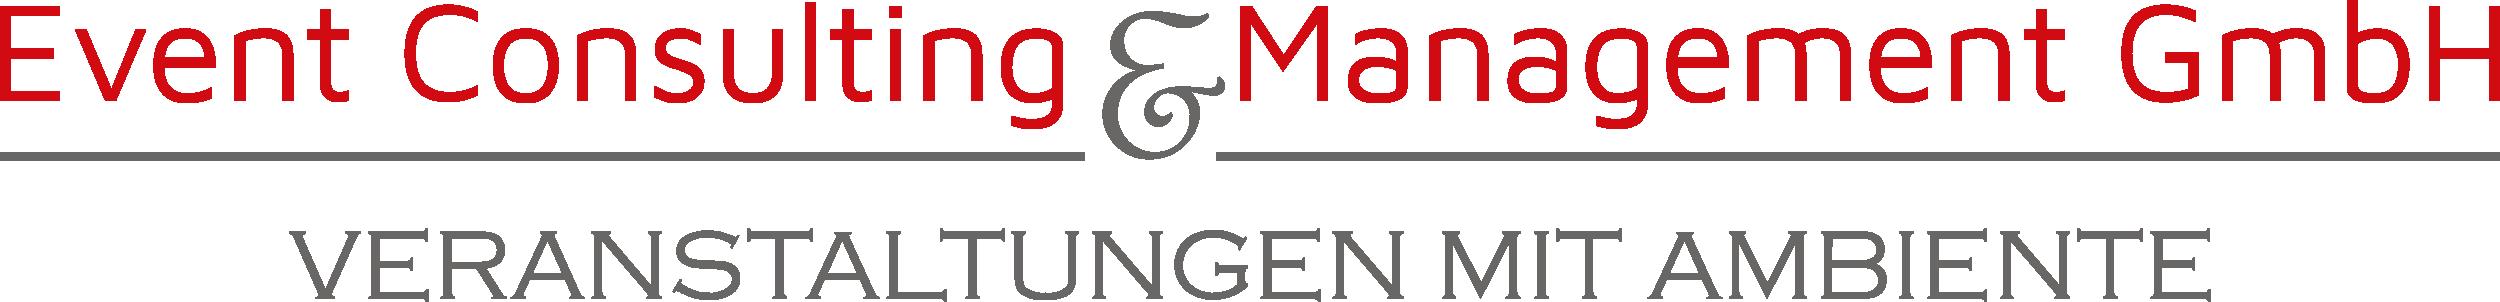 ECM GmbH